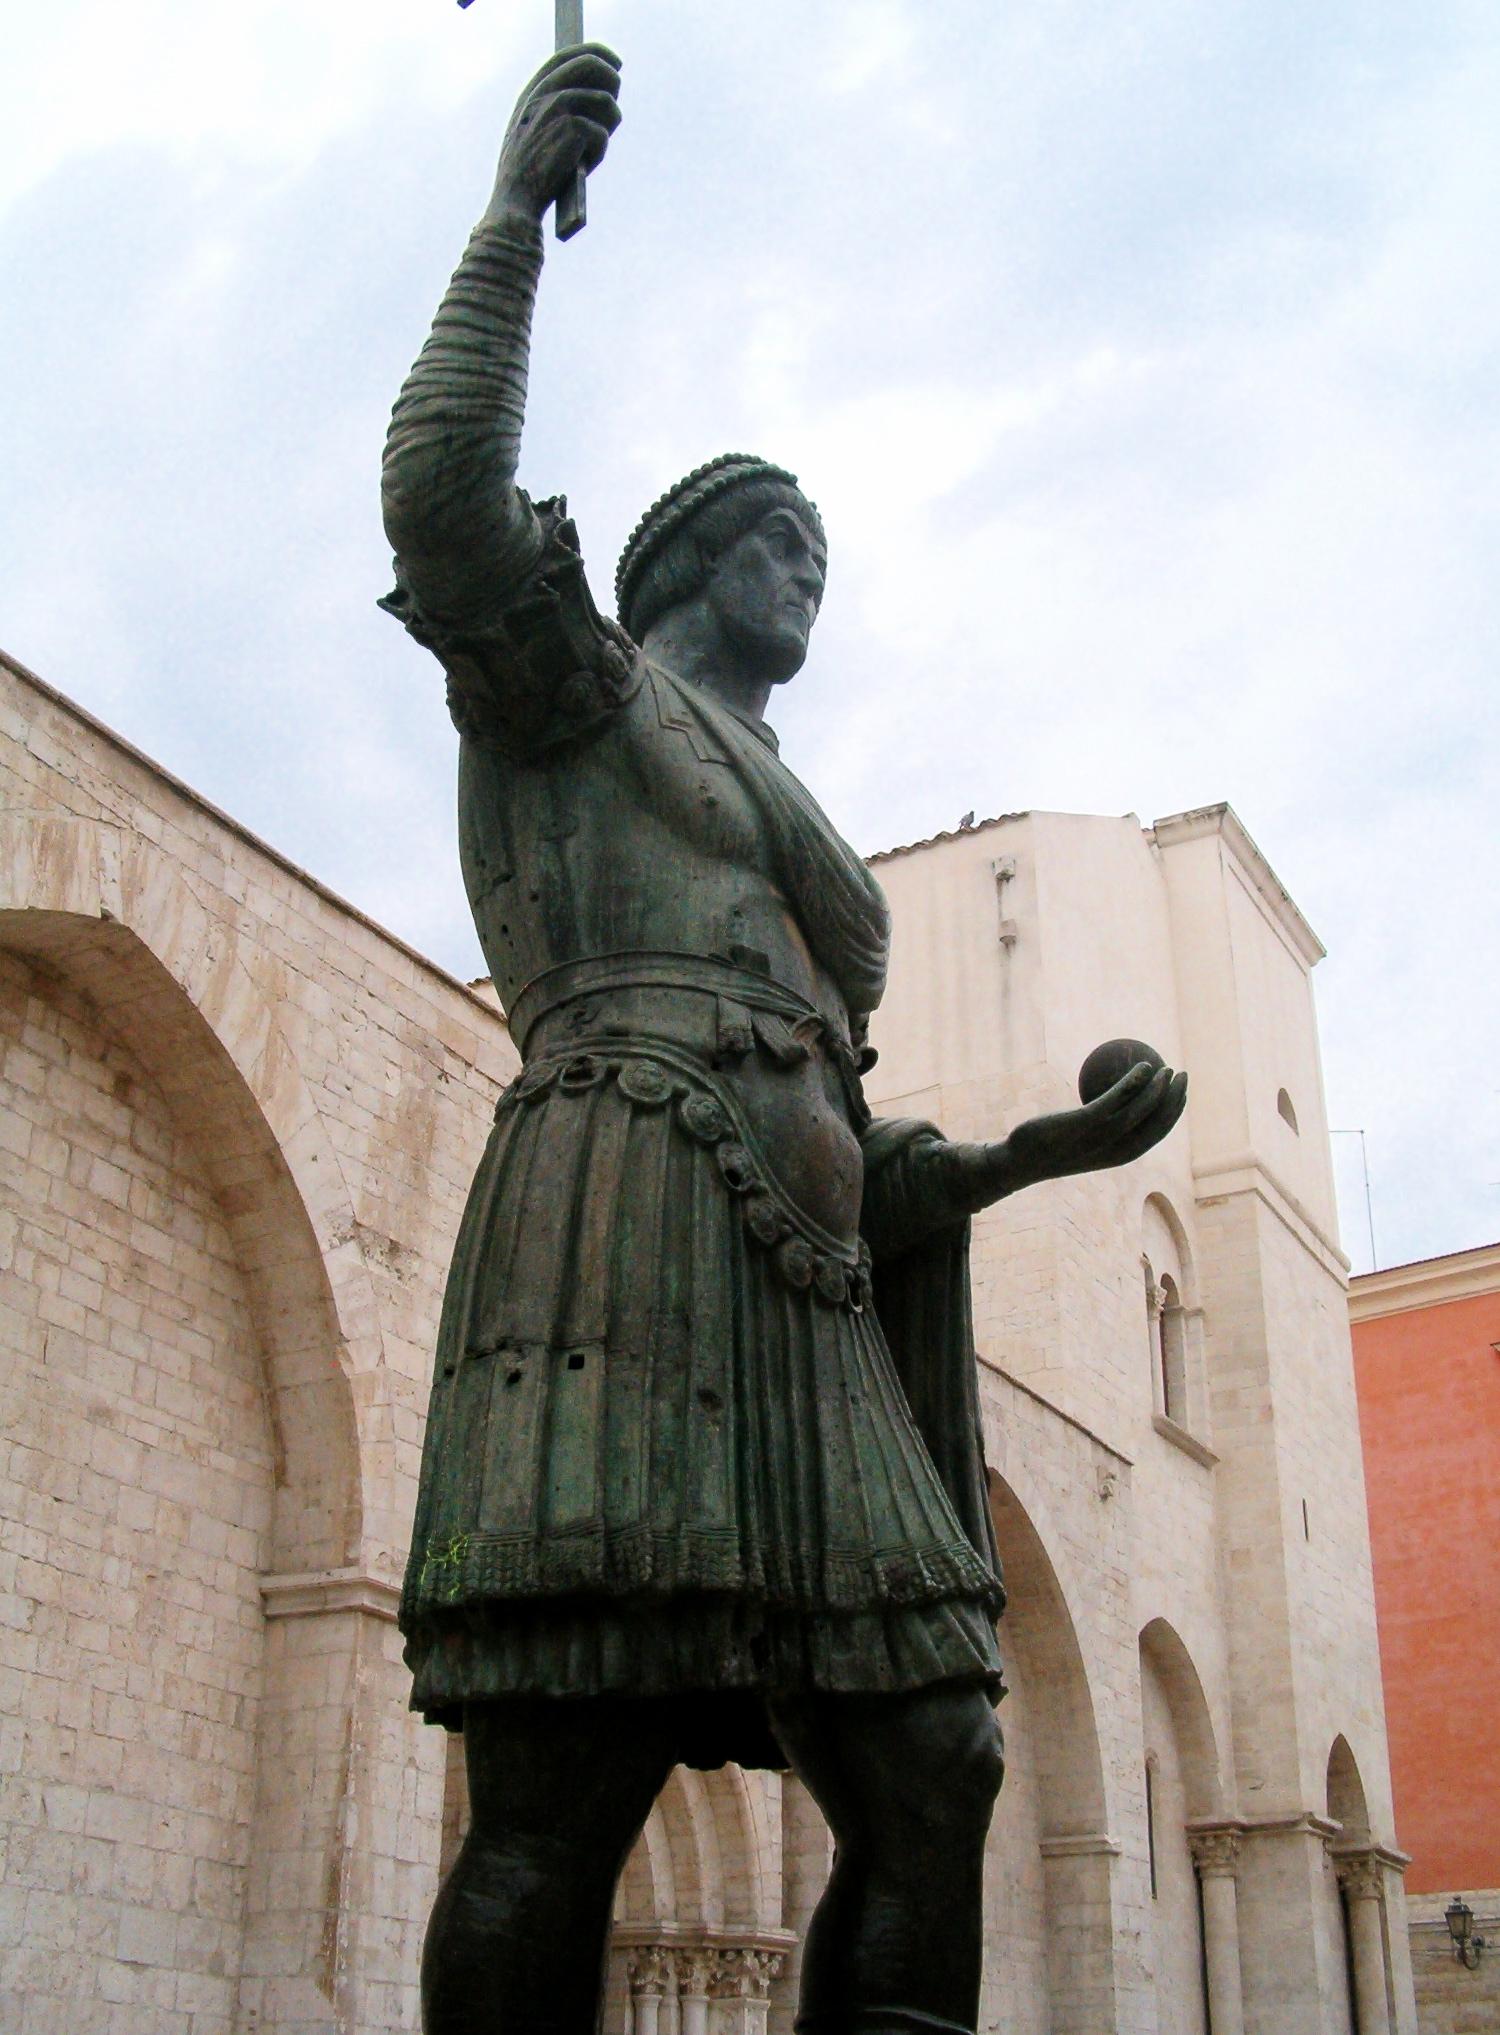 alfarano sindaco barletta statue - photo#6